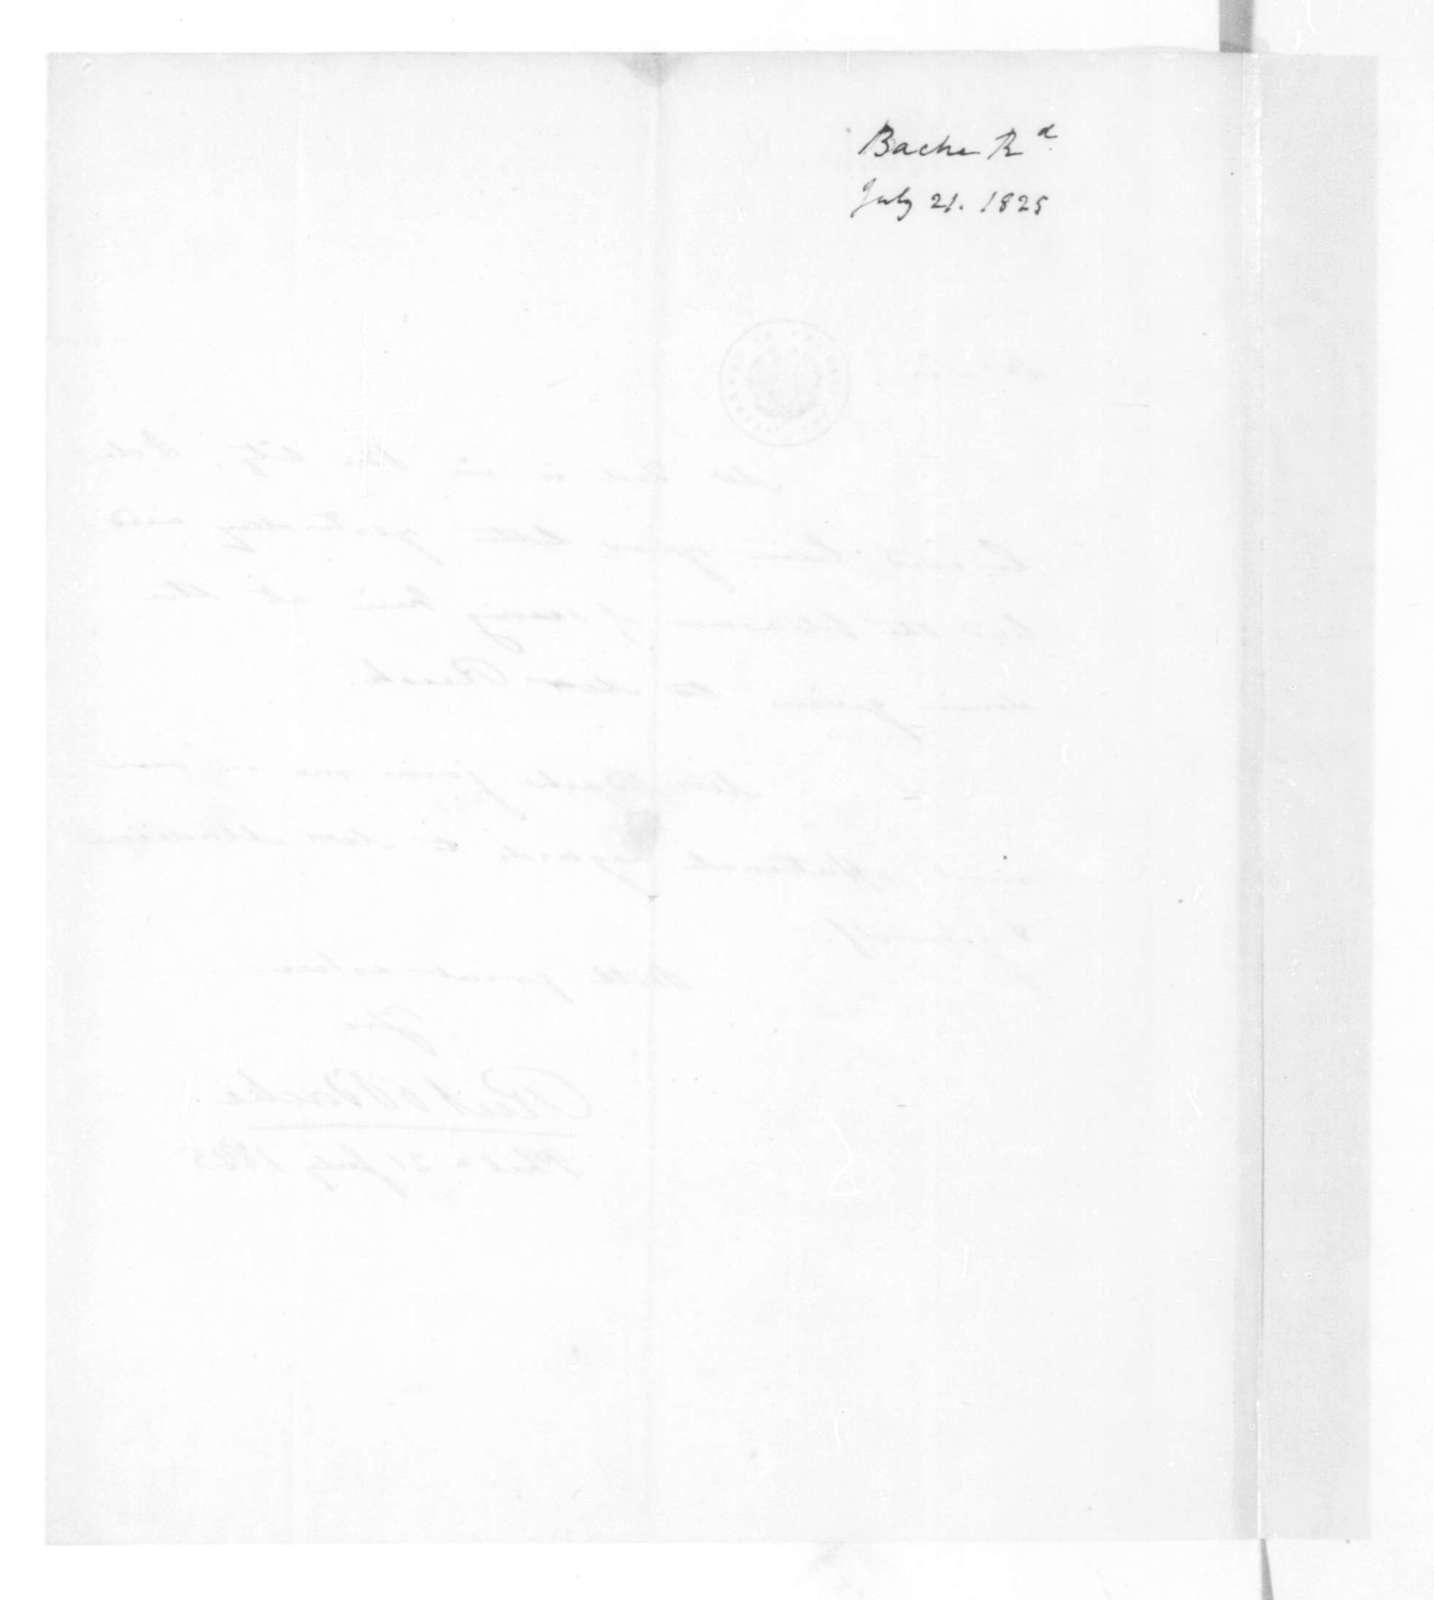 Richard Bache to James Madison, July 21, 1825.